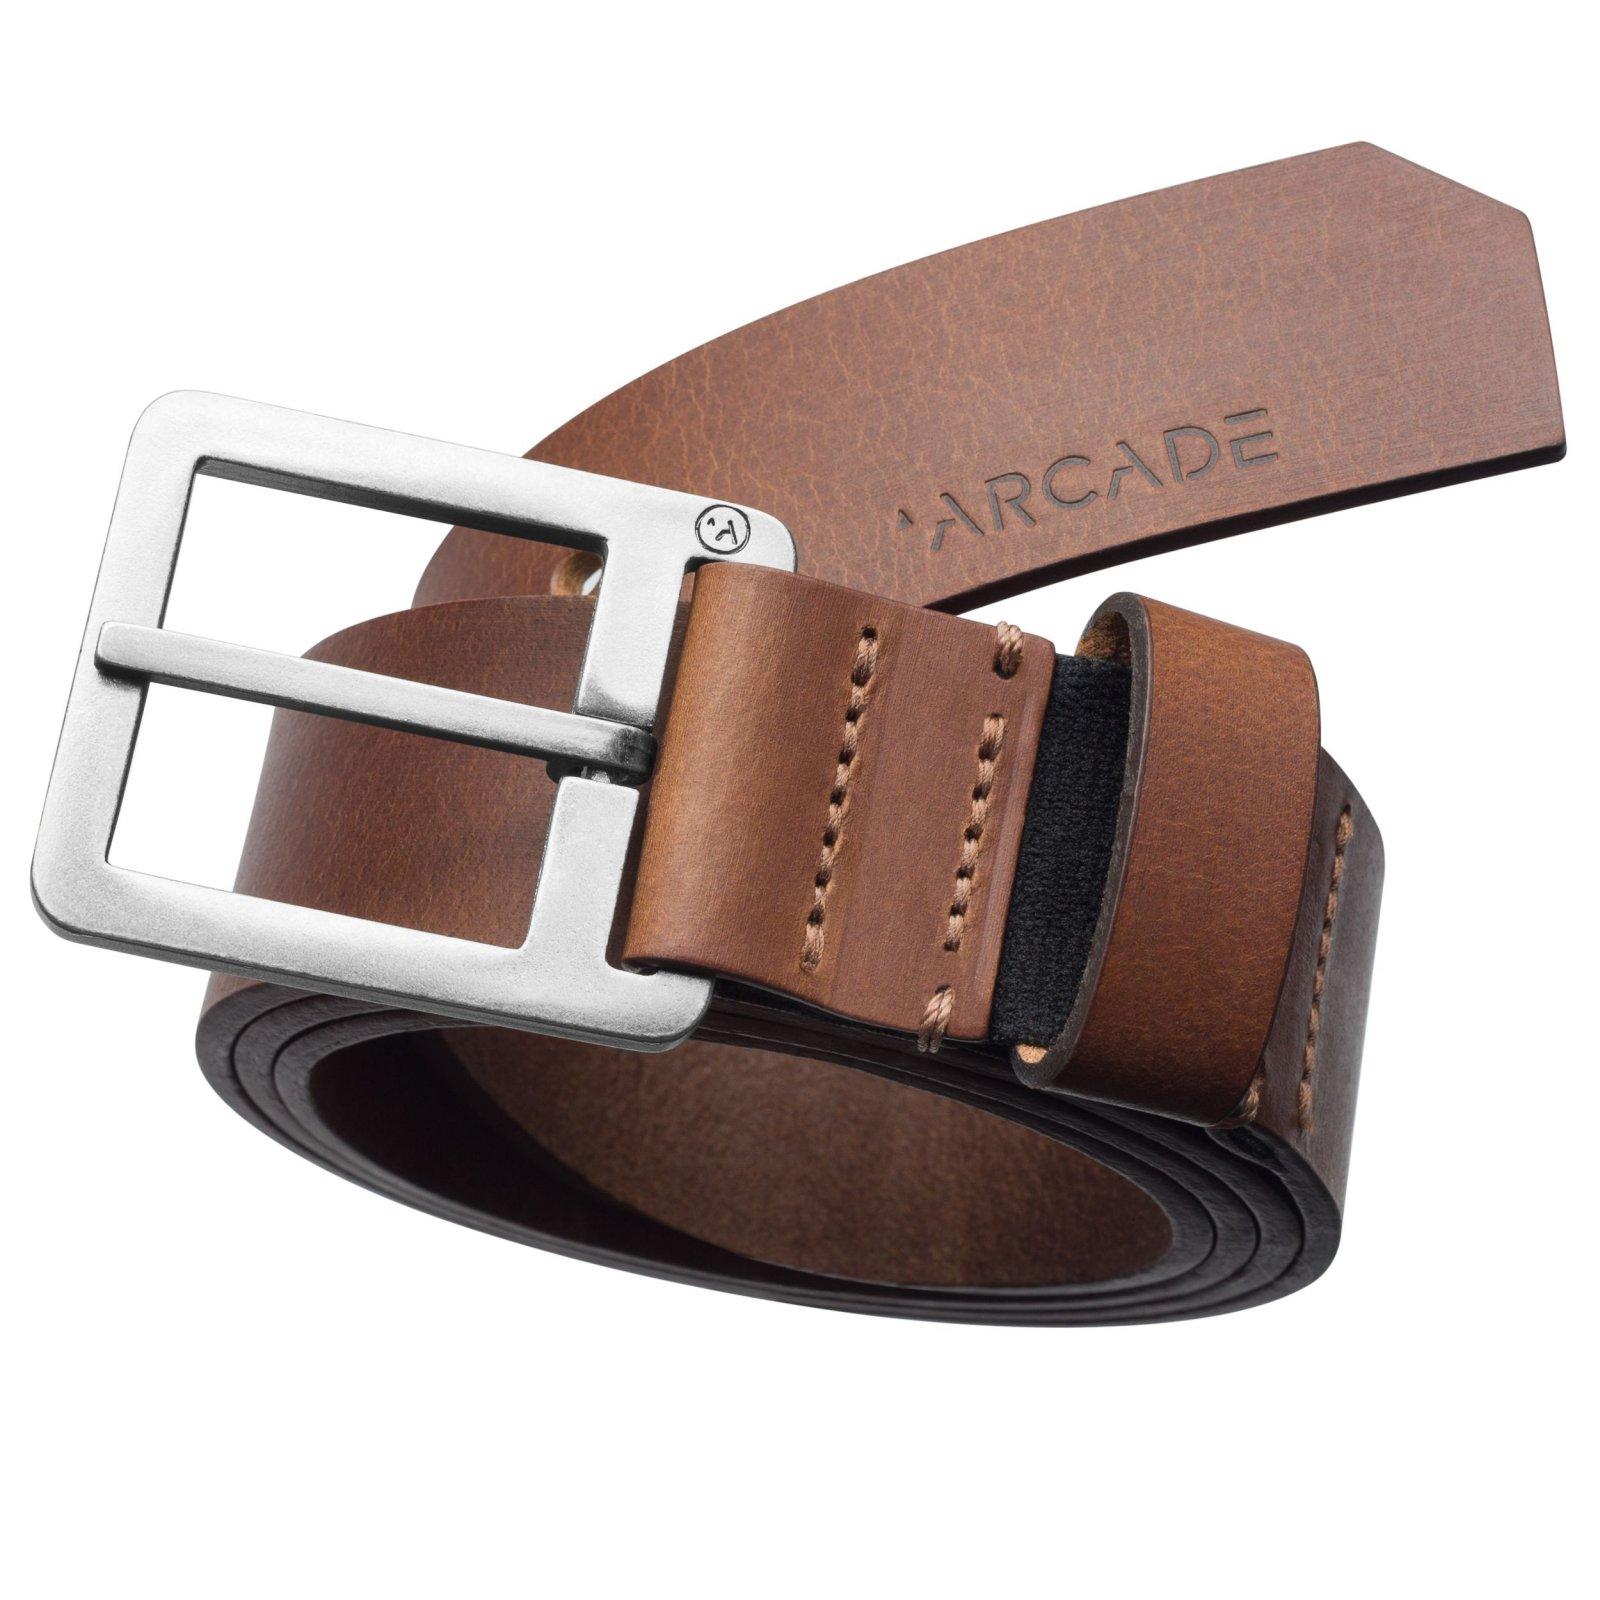 Arcade Padre Belt - Brown